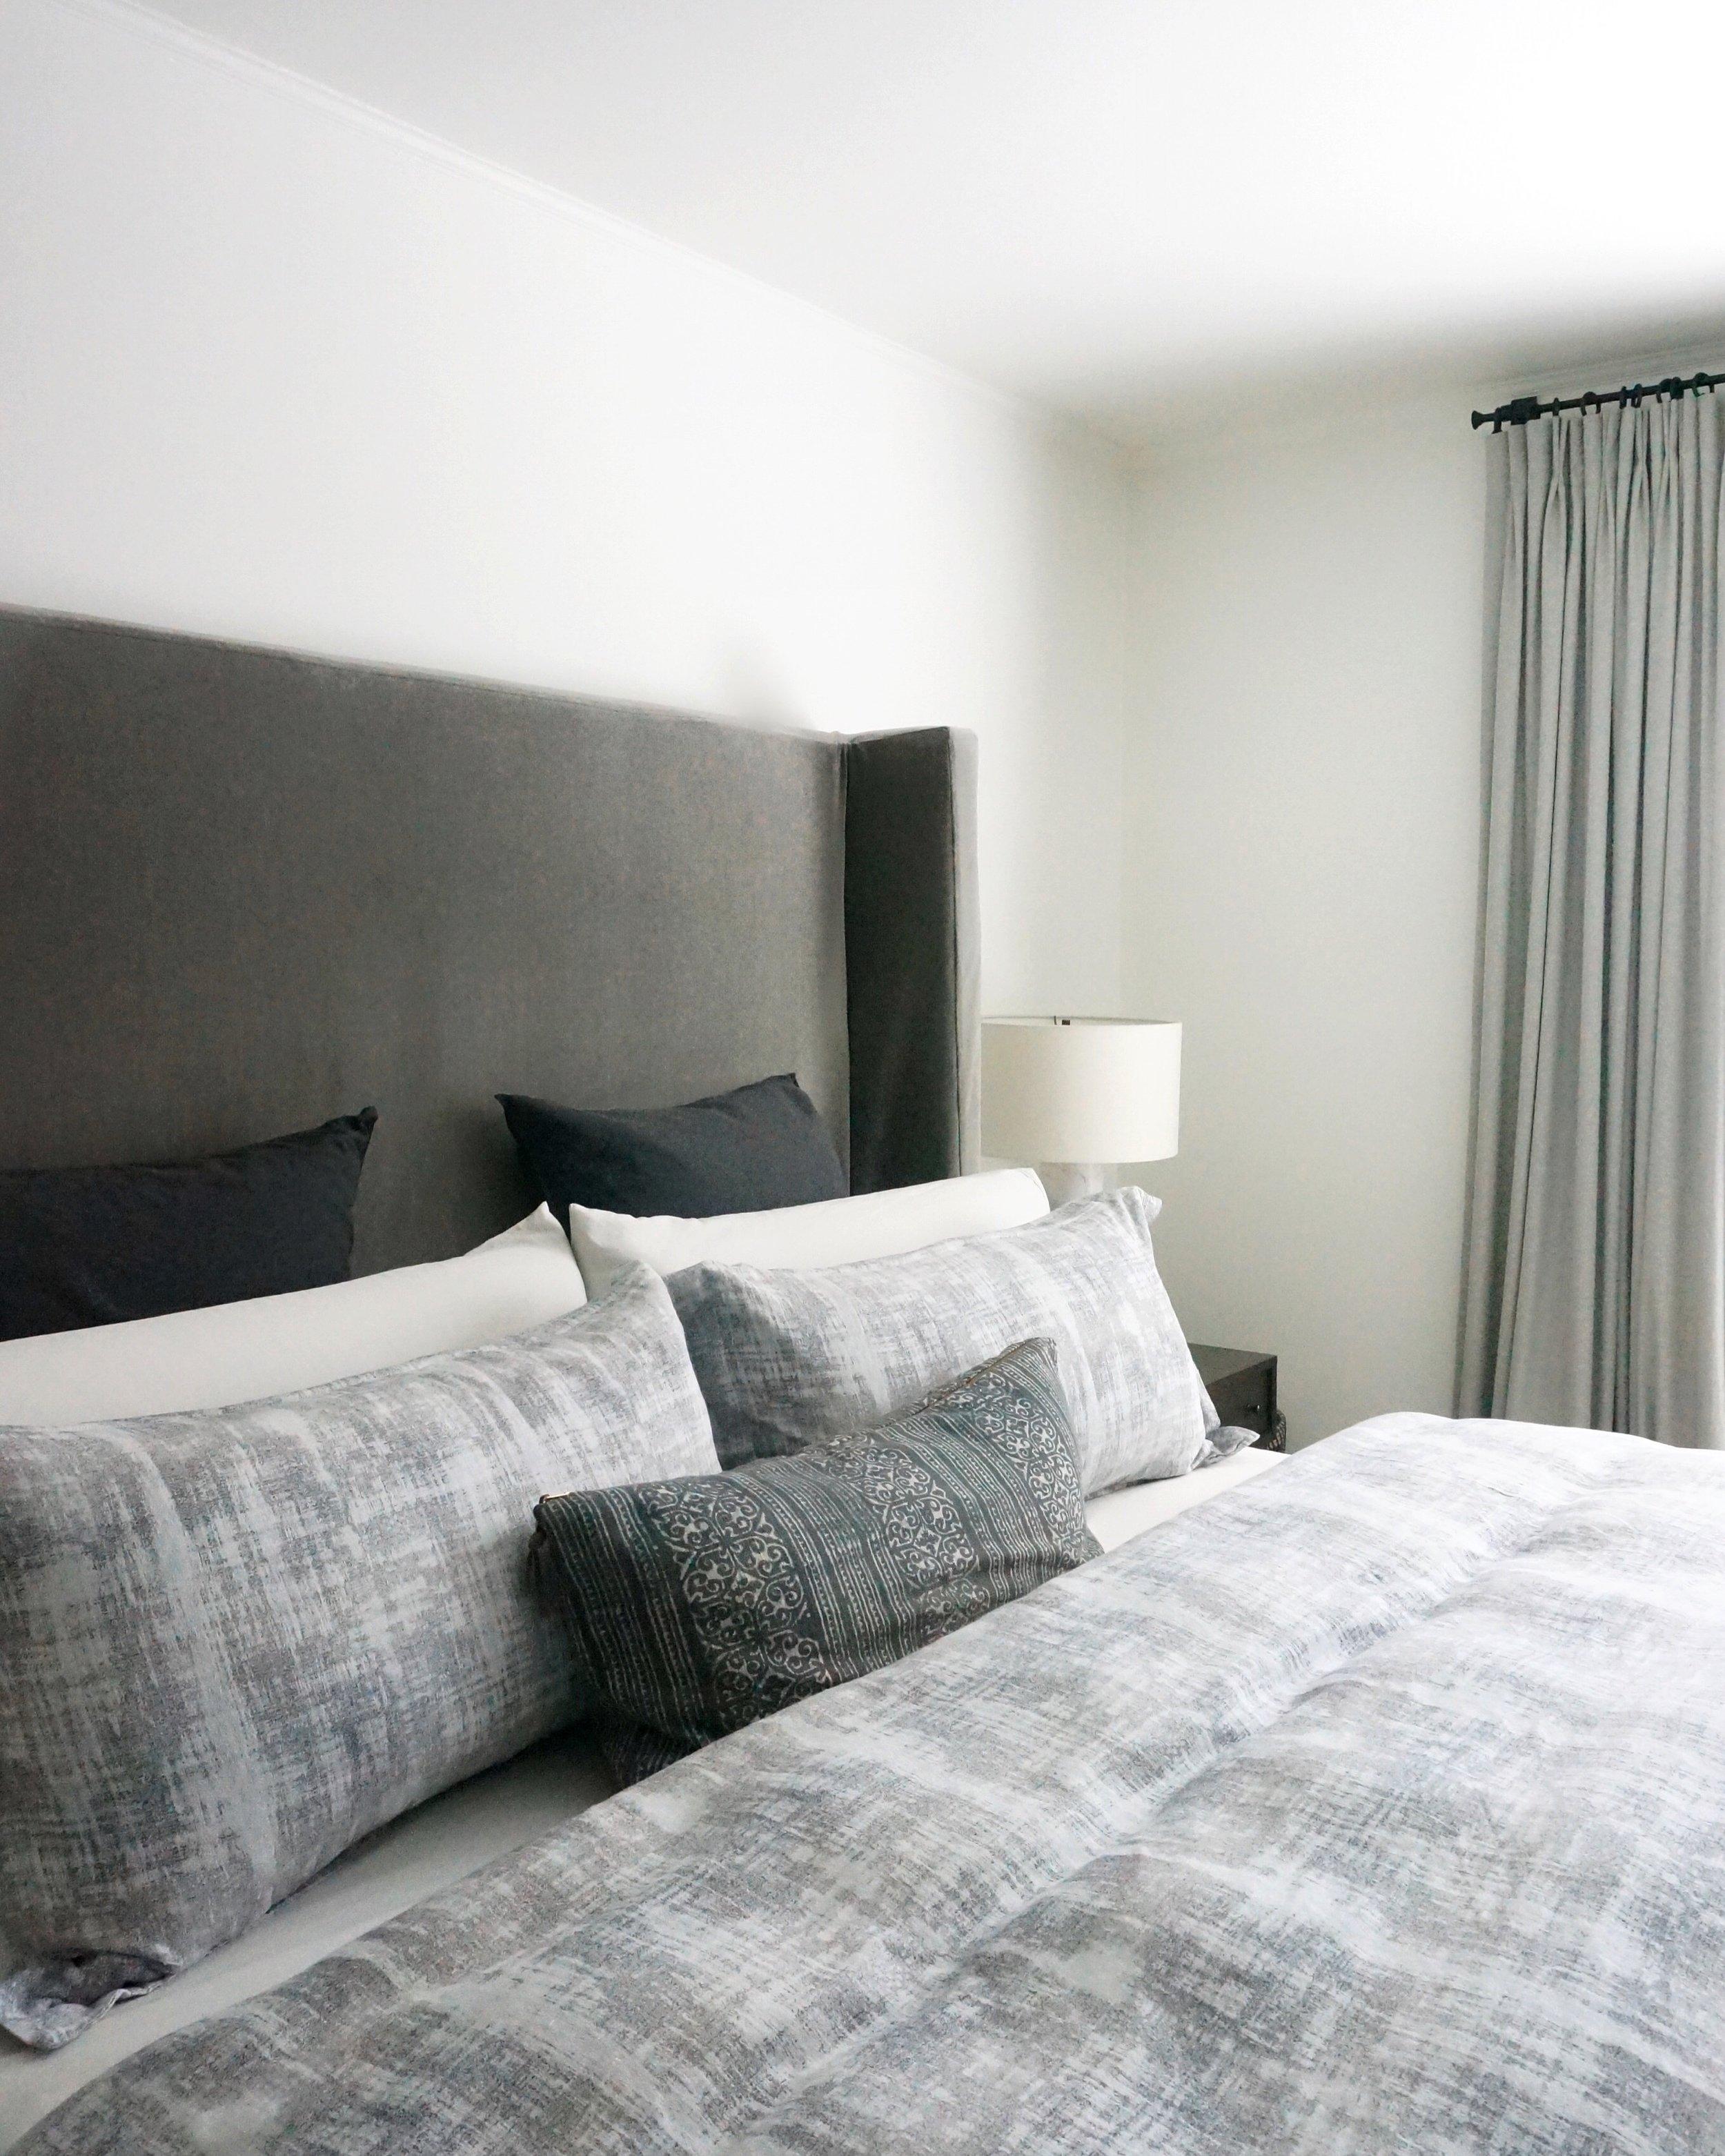 Studio-Chu-Apartment-17-Bedroom-2.jpg